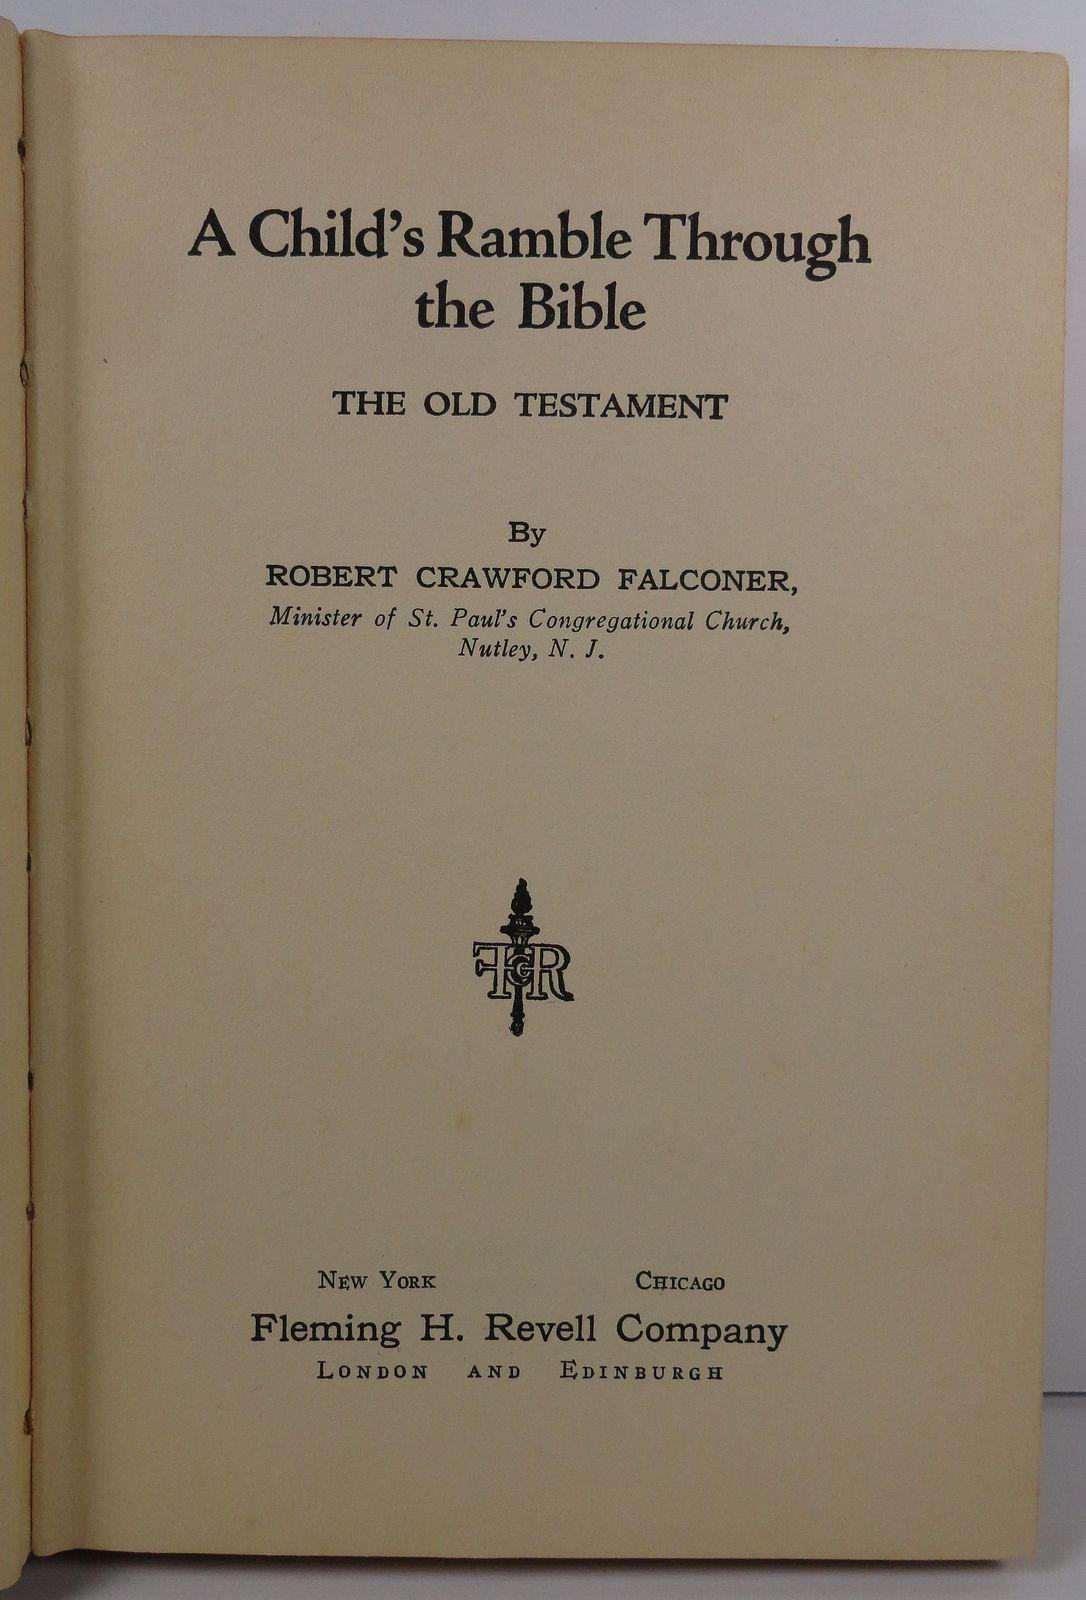 A Child's Ramble Through the Bible Robert Crawford Falconer